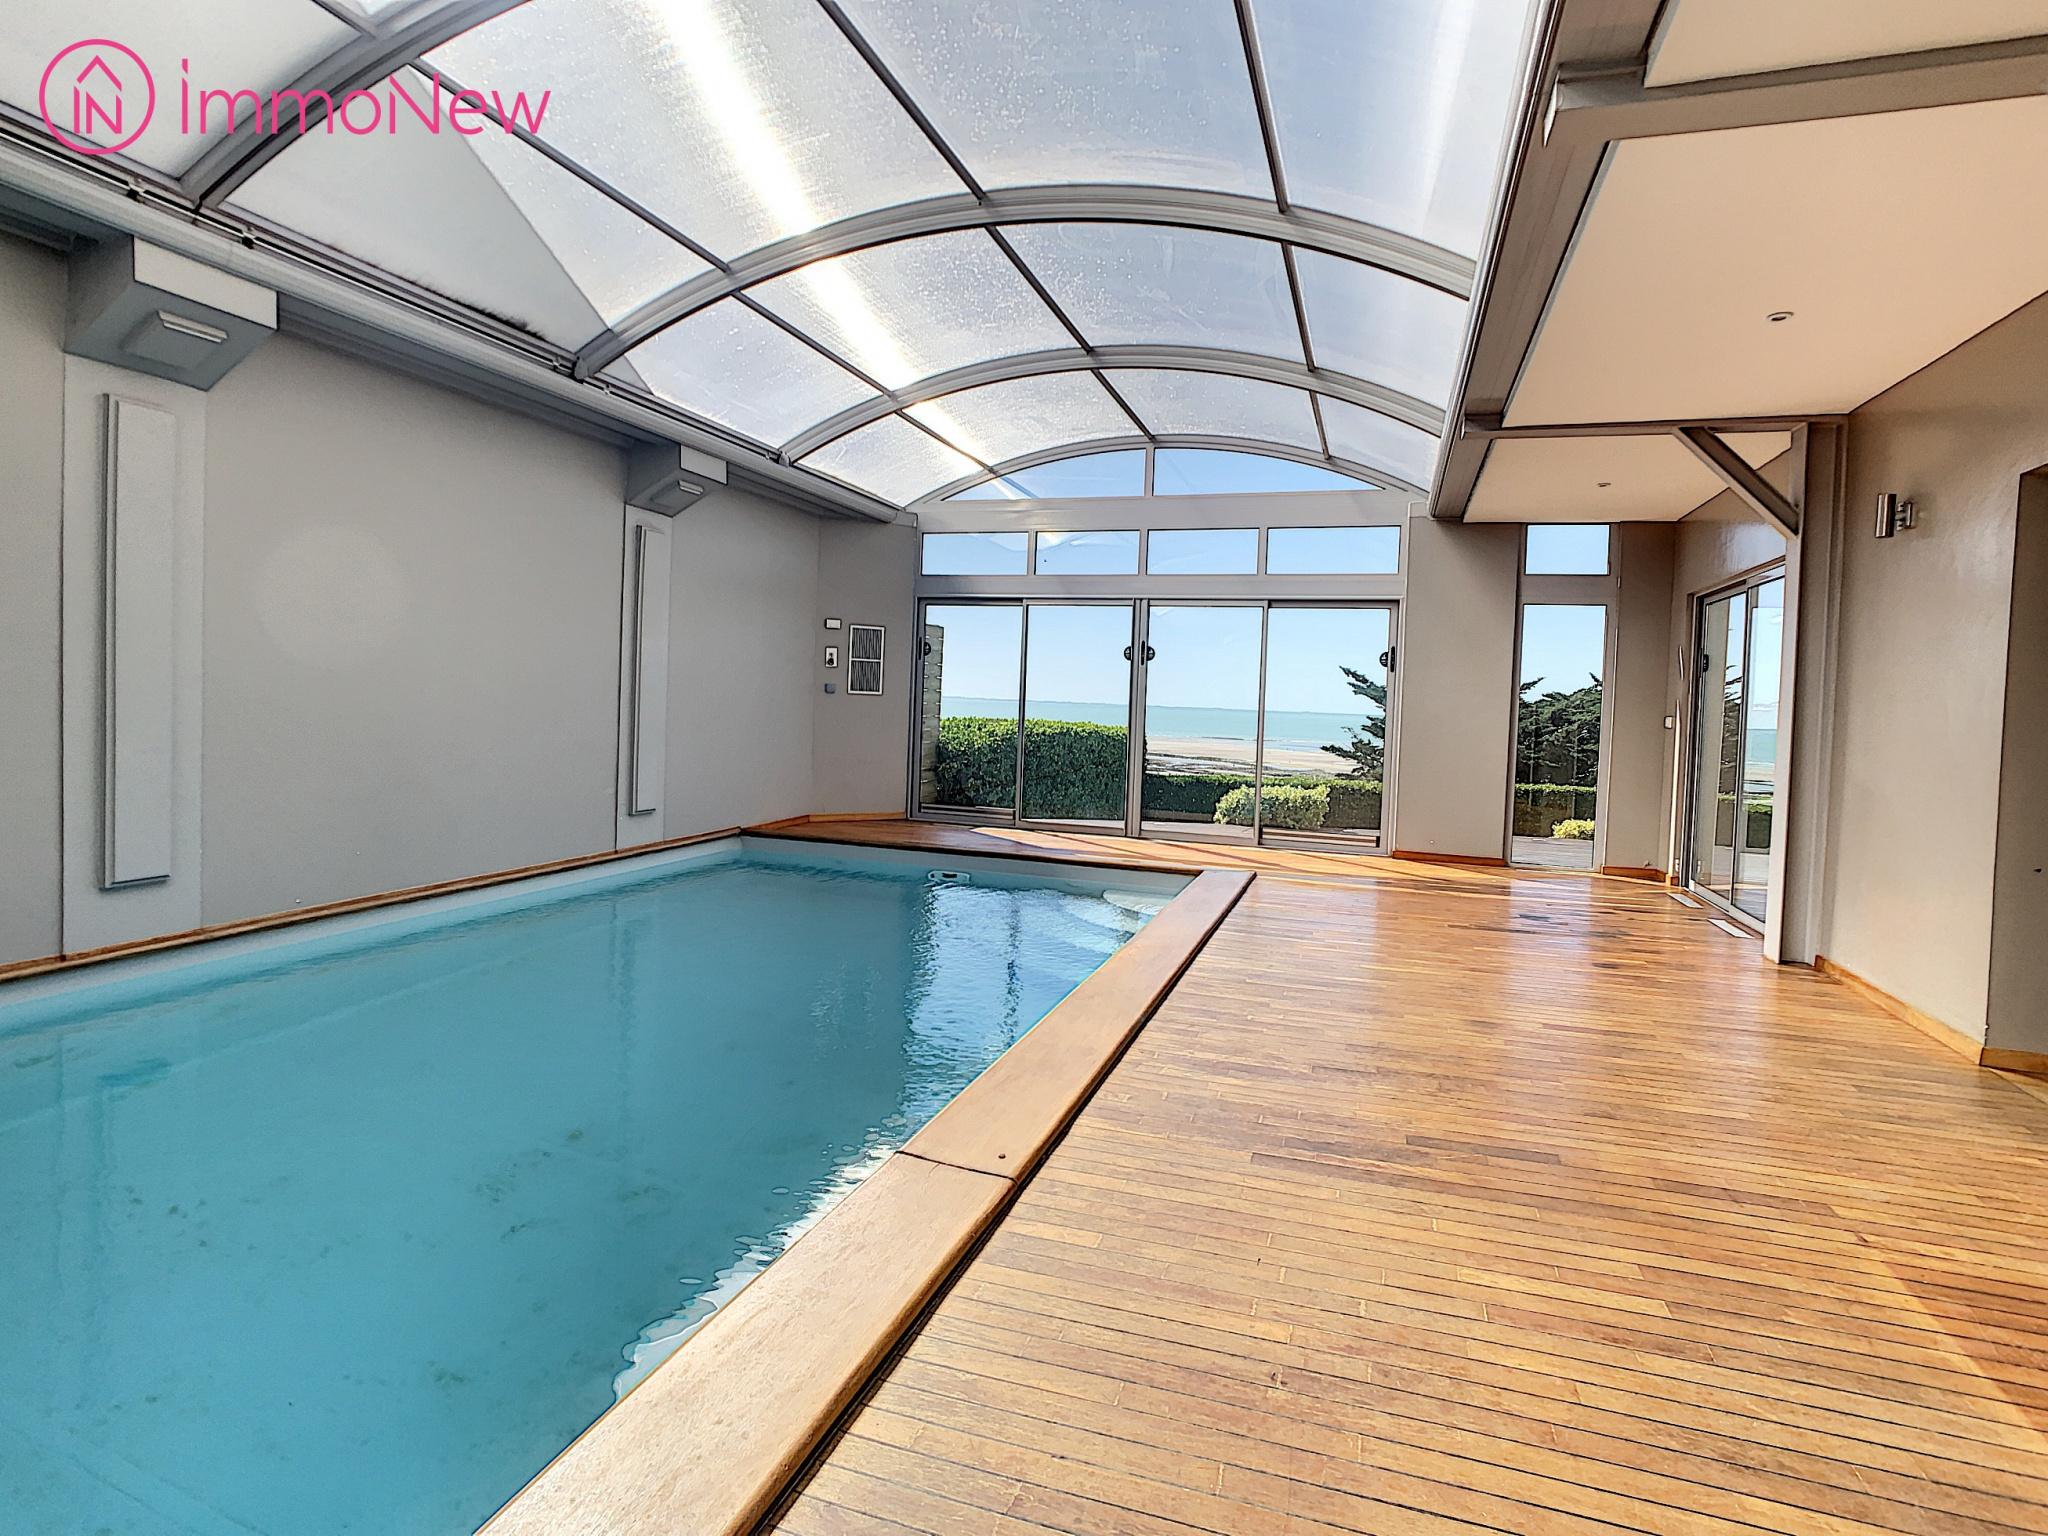 Vente Villa De Prestige Vue Mer Avec Piscine Interieure